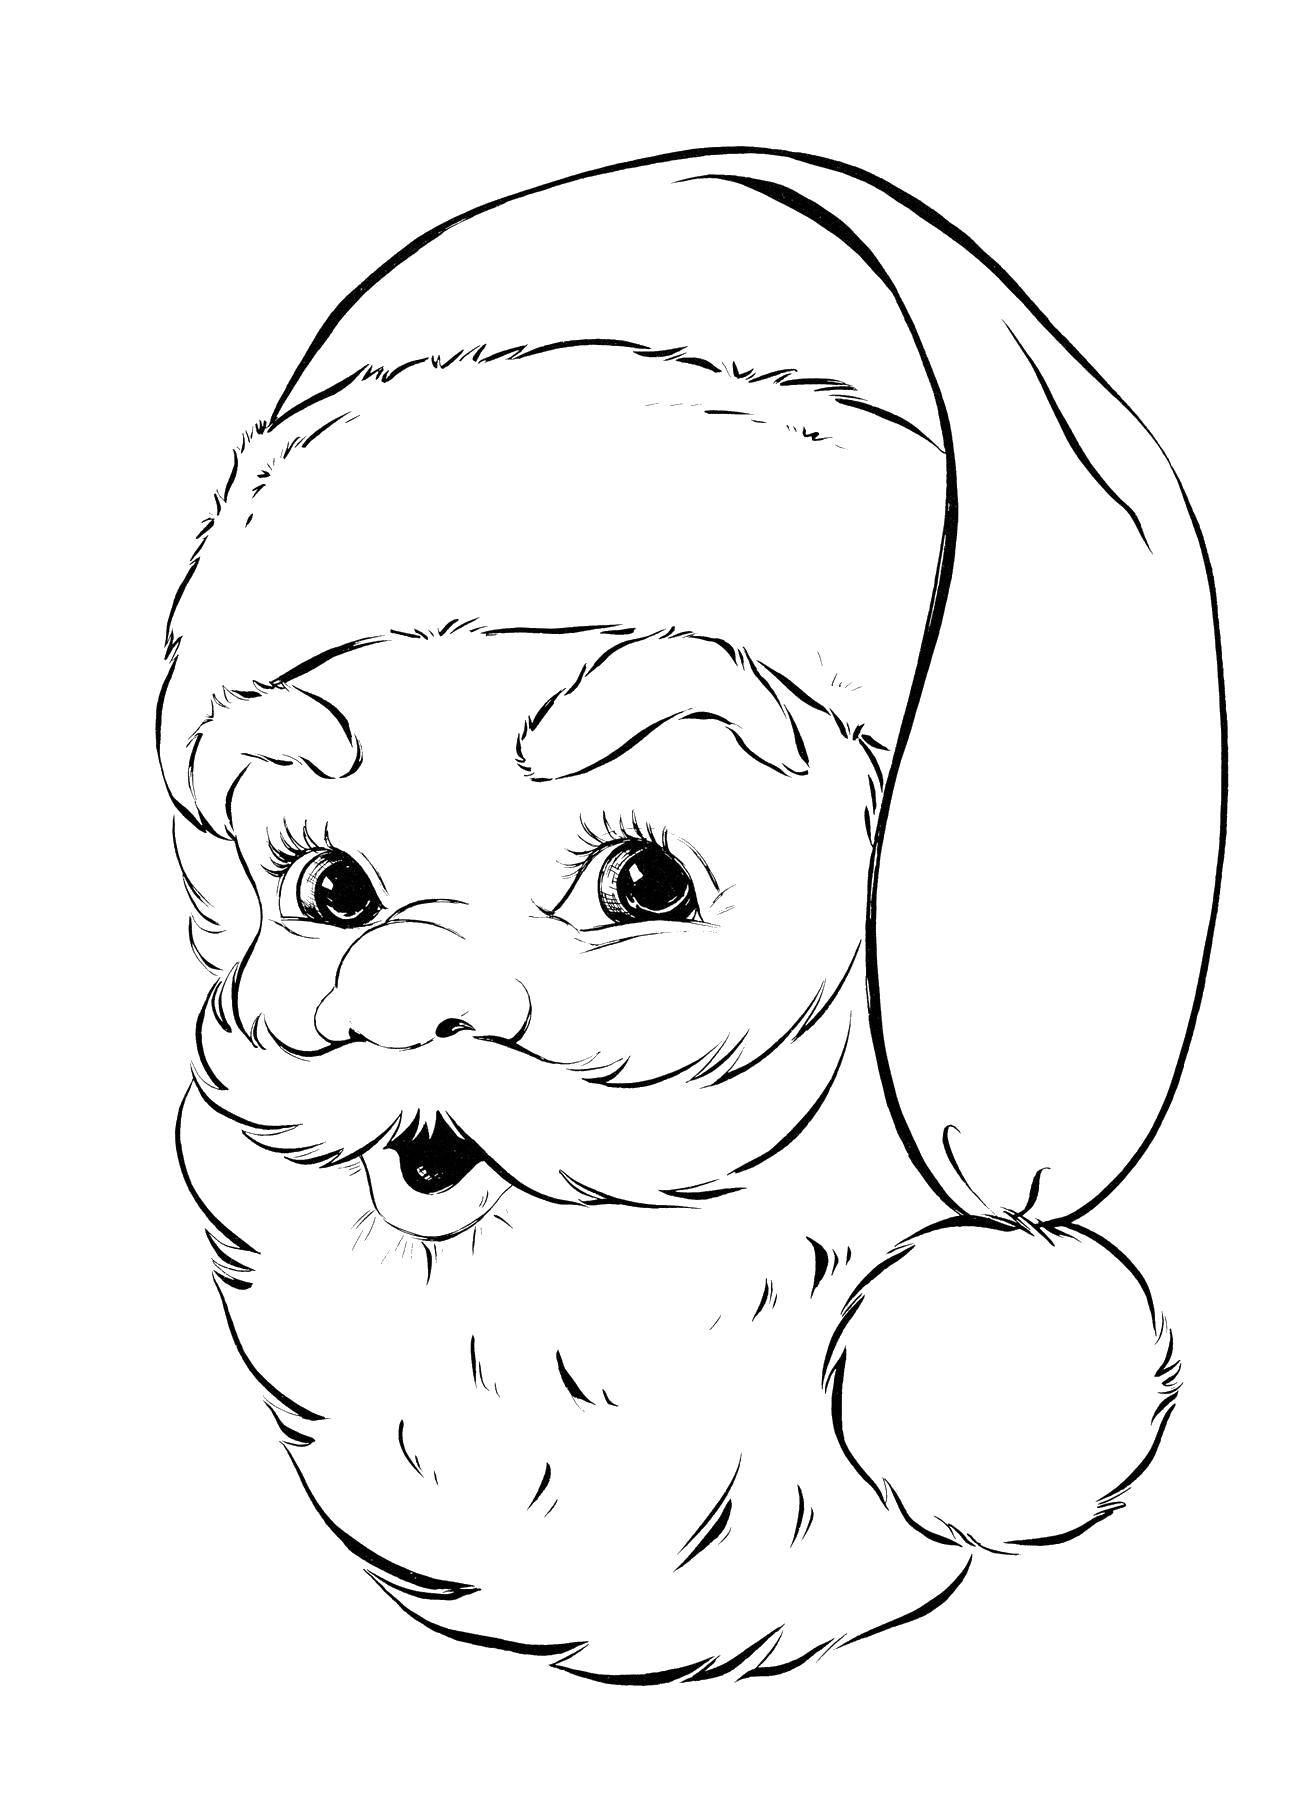 Раскраска Санта клаус! Скачать Рождество, Санта Клаус.  Распечатать ,Рождество,